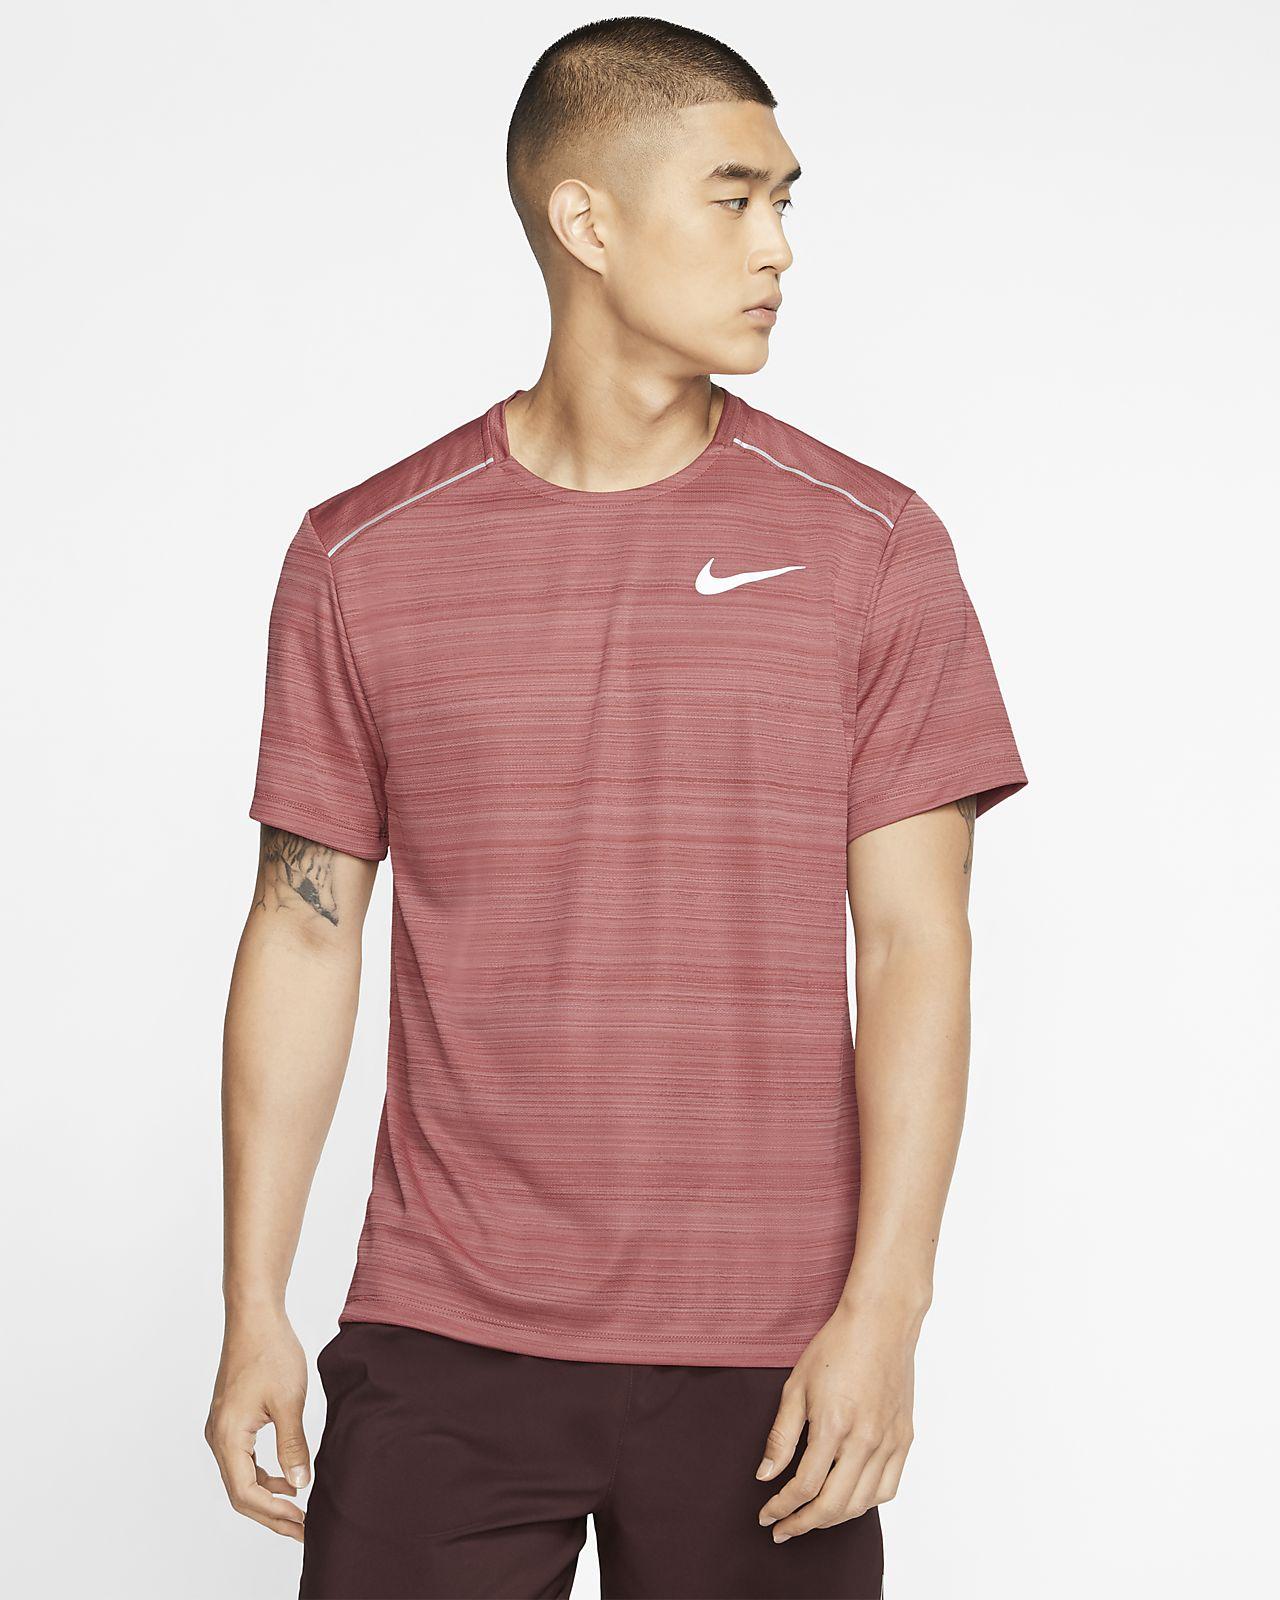 Nike Dri FIT Miler Camiseta de running de manga corta Hombre